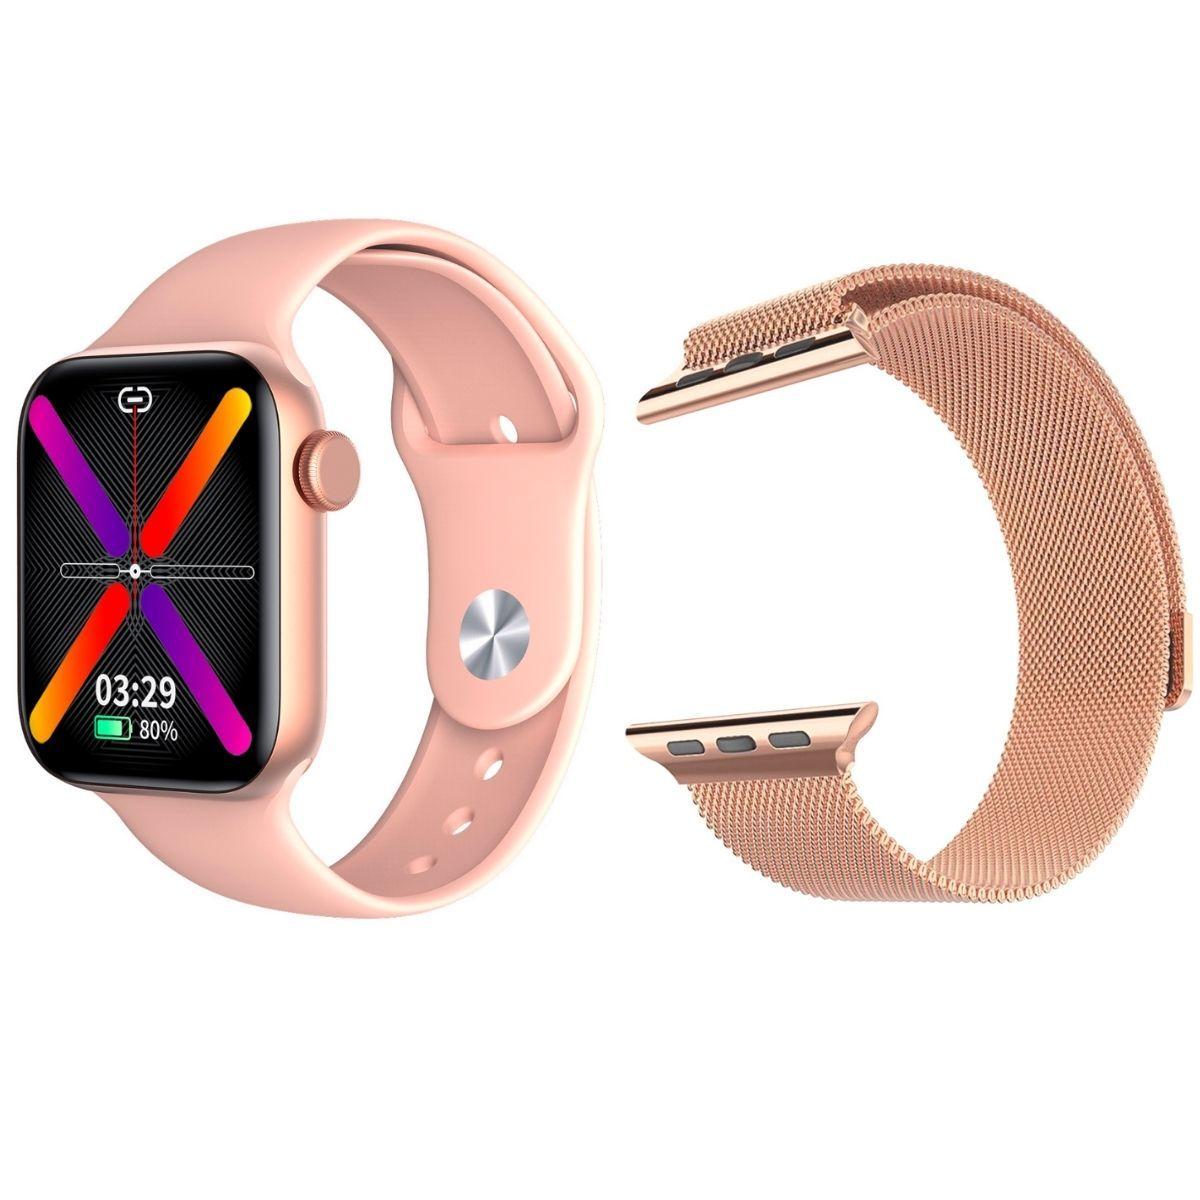 Смарт часы и браслеты Смарт часы KingWear LW12 (розовые) с Миланским браслетом LW12_Milanese_Loop.jpg